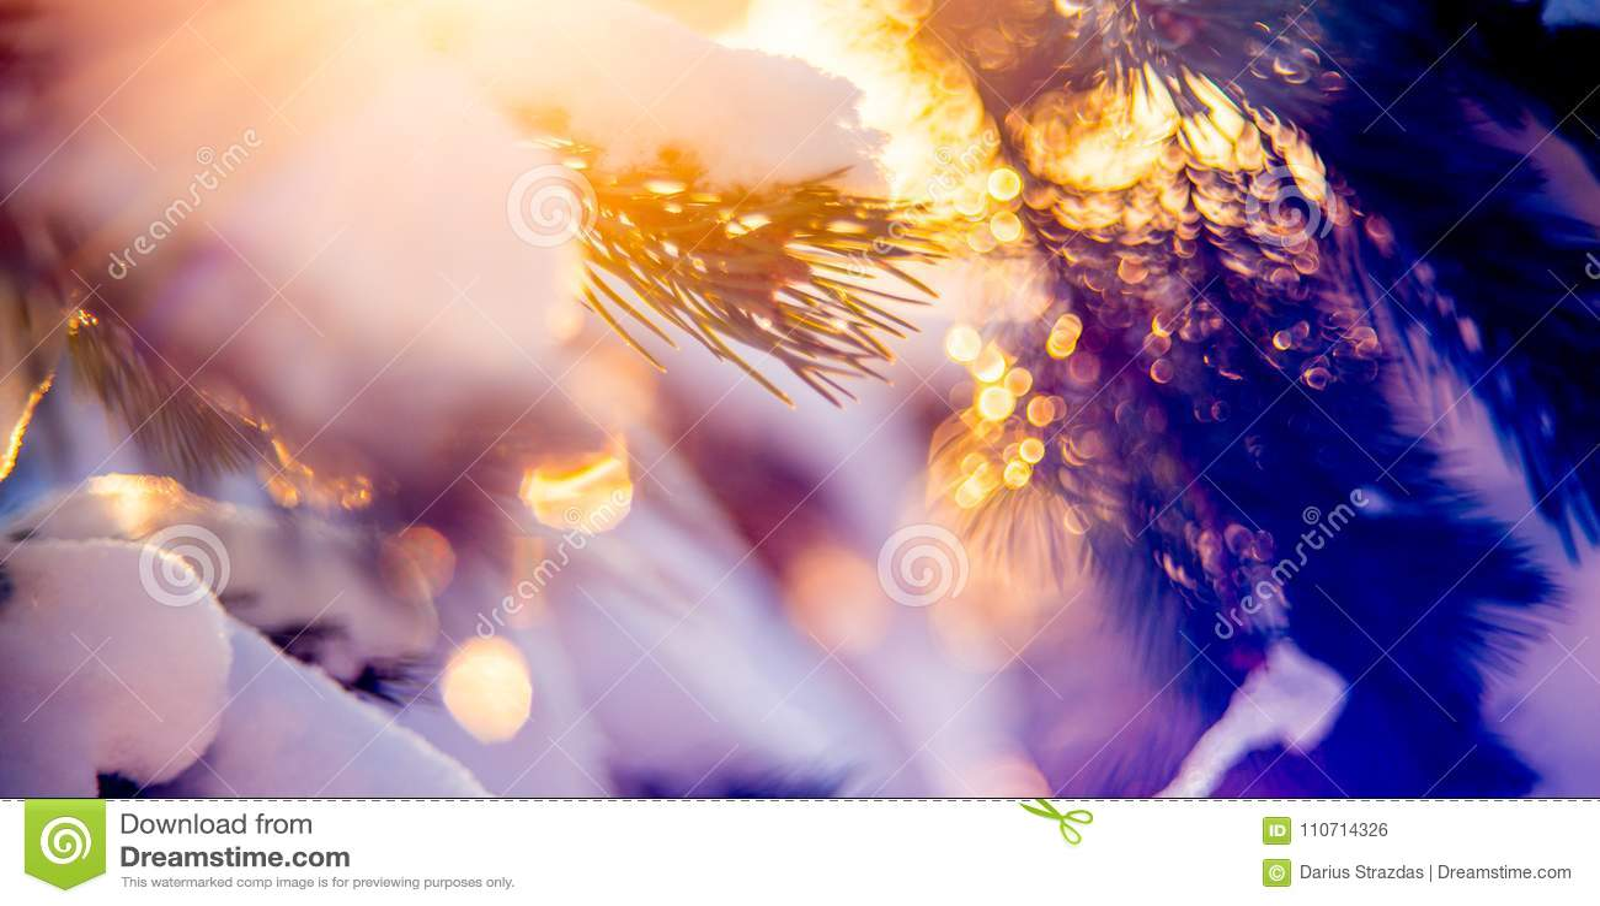 Nature winter detail macro